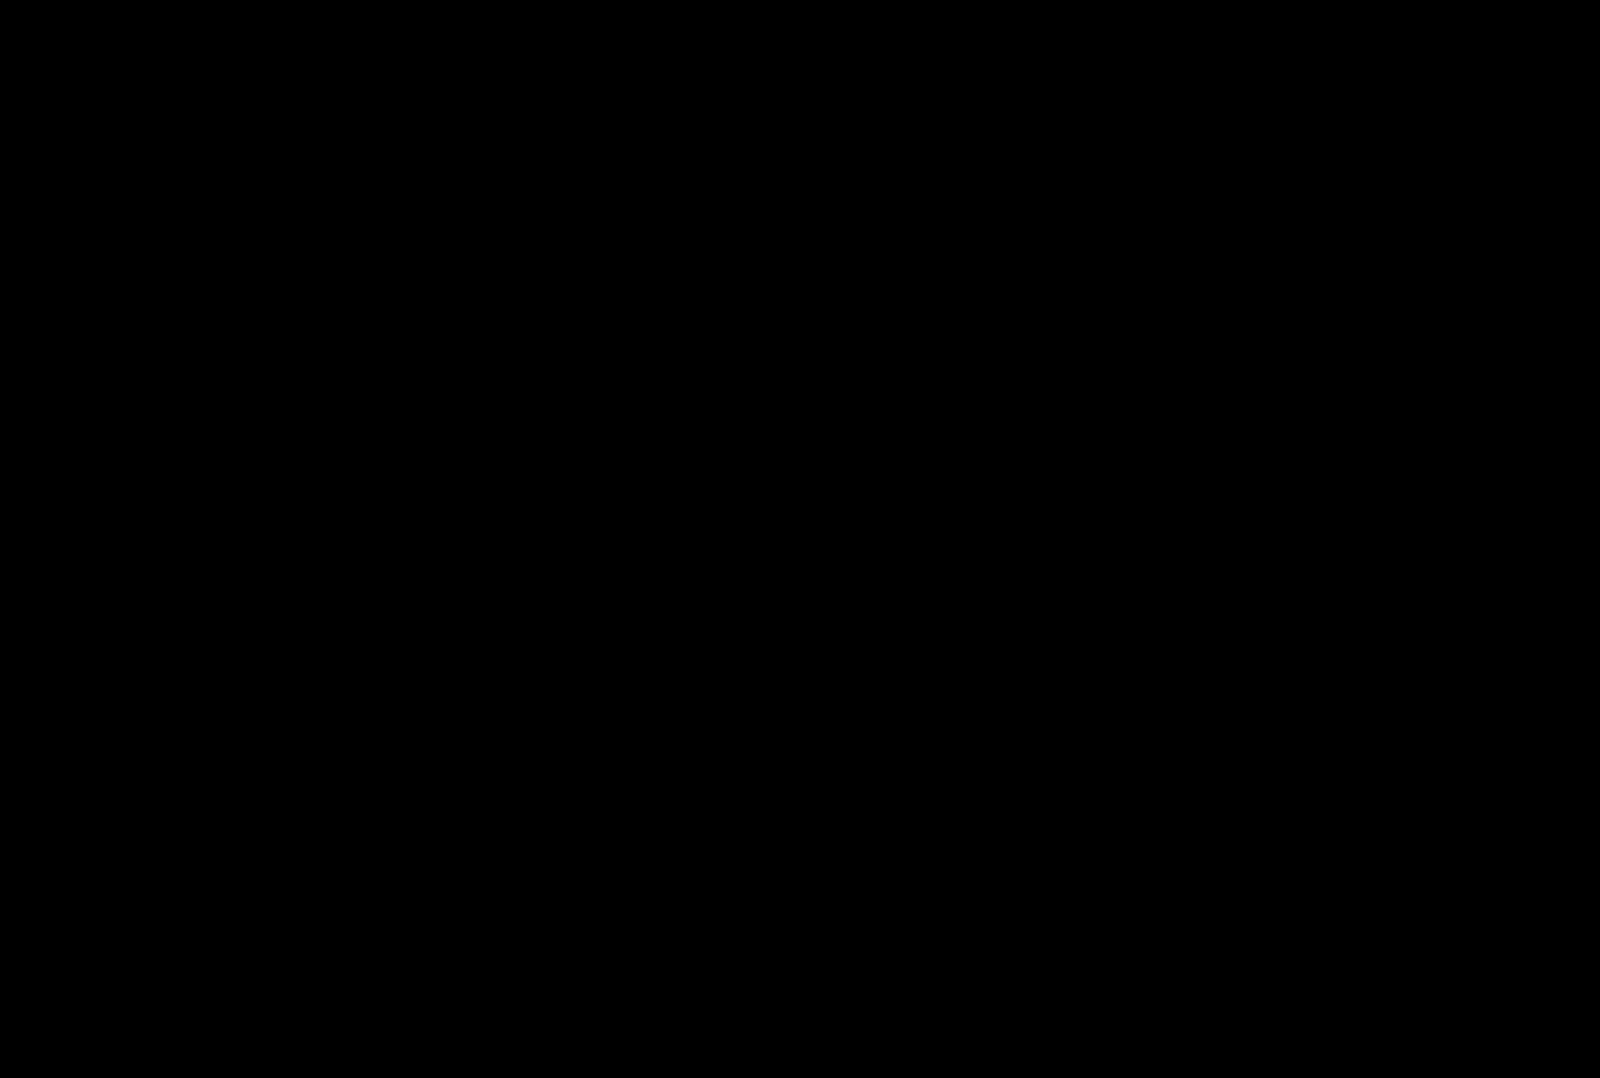 regla Duplicar Propiedad  download logo adidas svg eps png psd ai vector color free - el fonts vectors